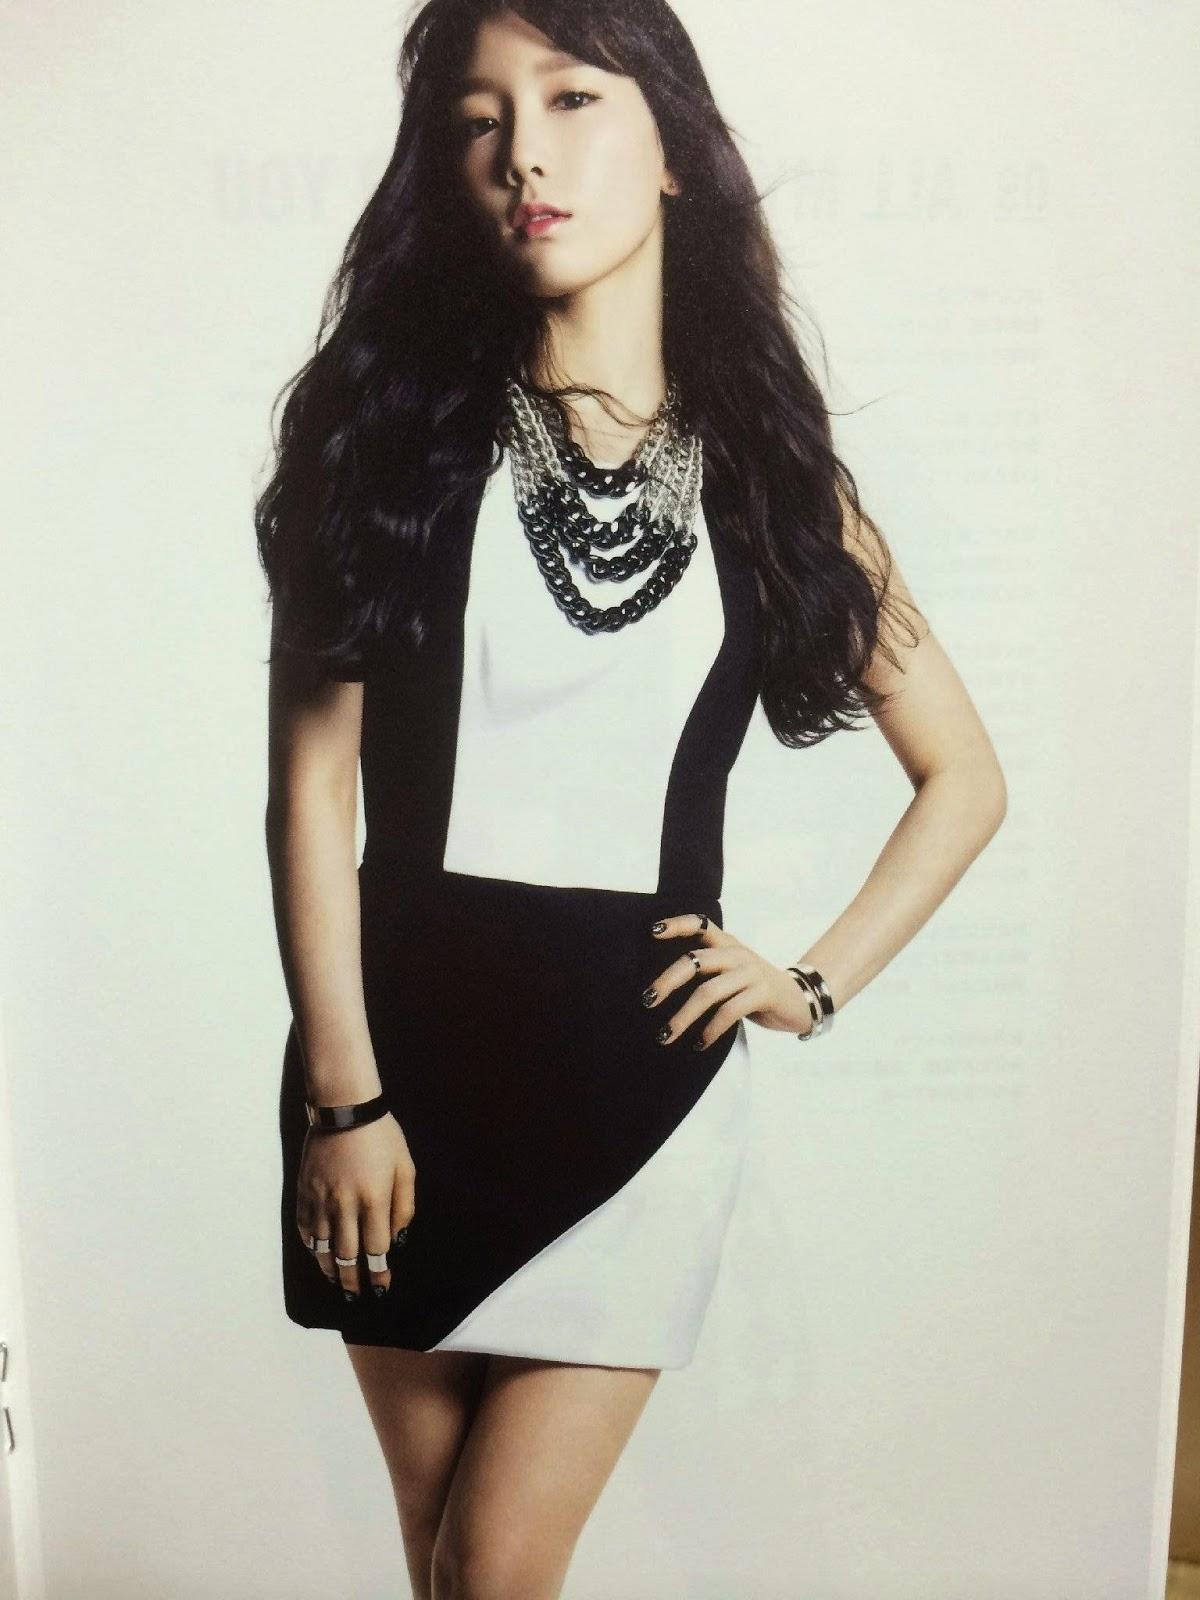 SNSD Taeyeon (태연; テヨン) Girls Generation The Best Scan Photos 3